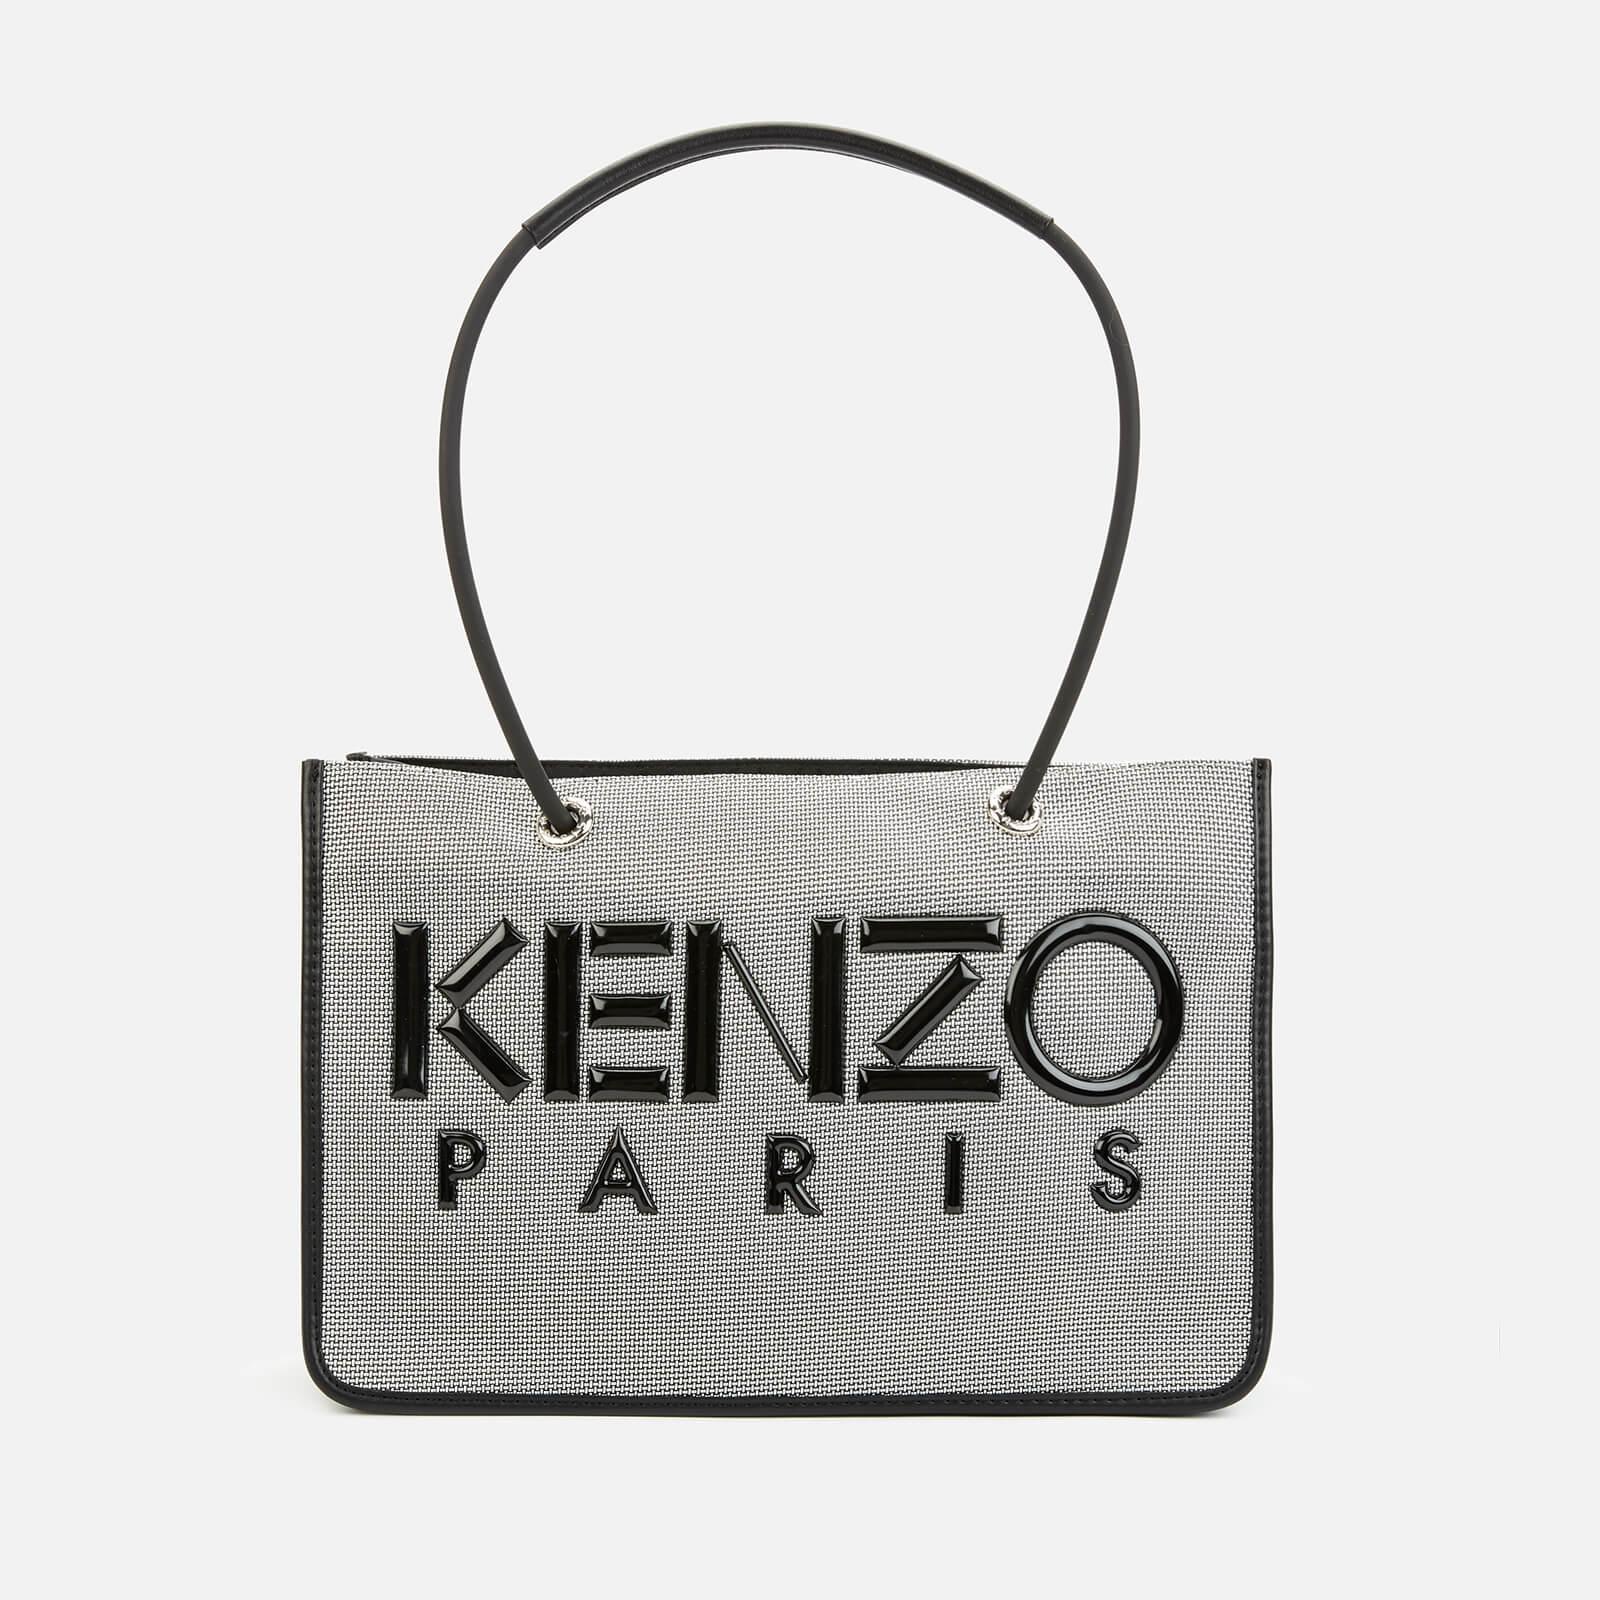 KENZO女士徽标手提袋